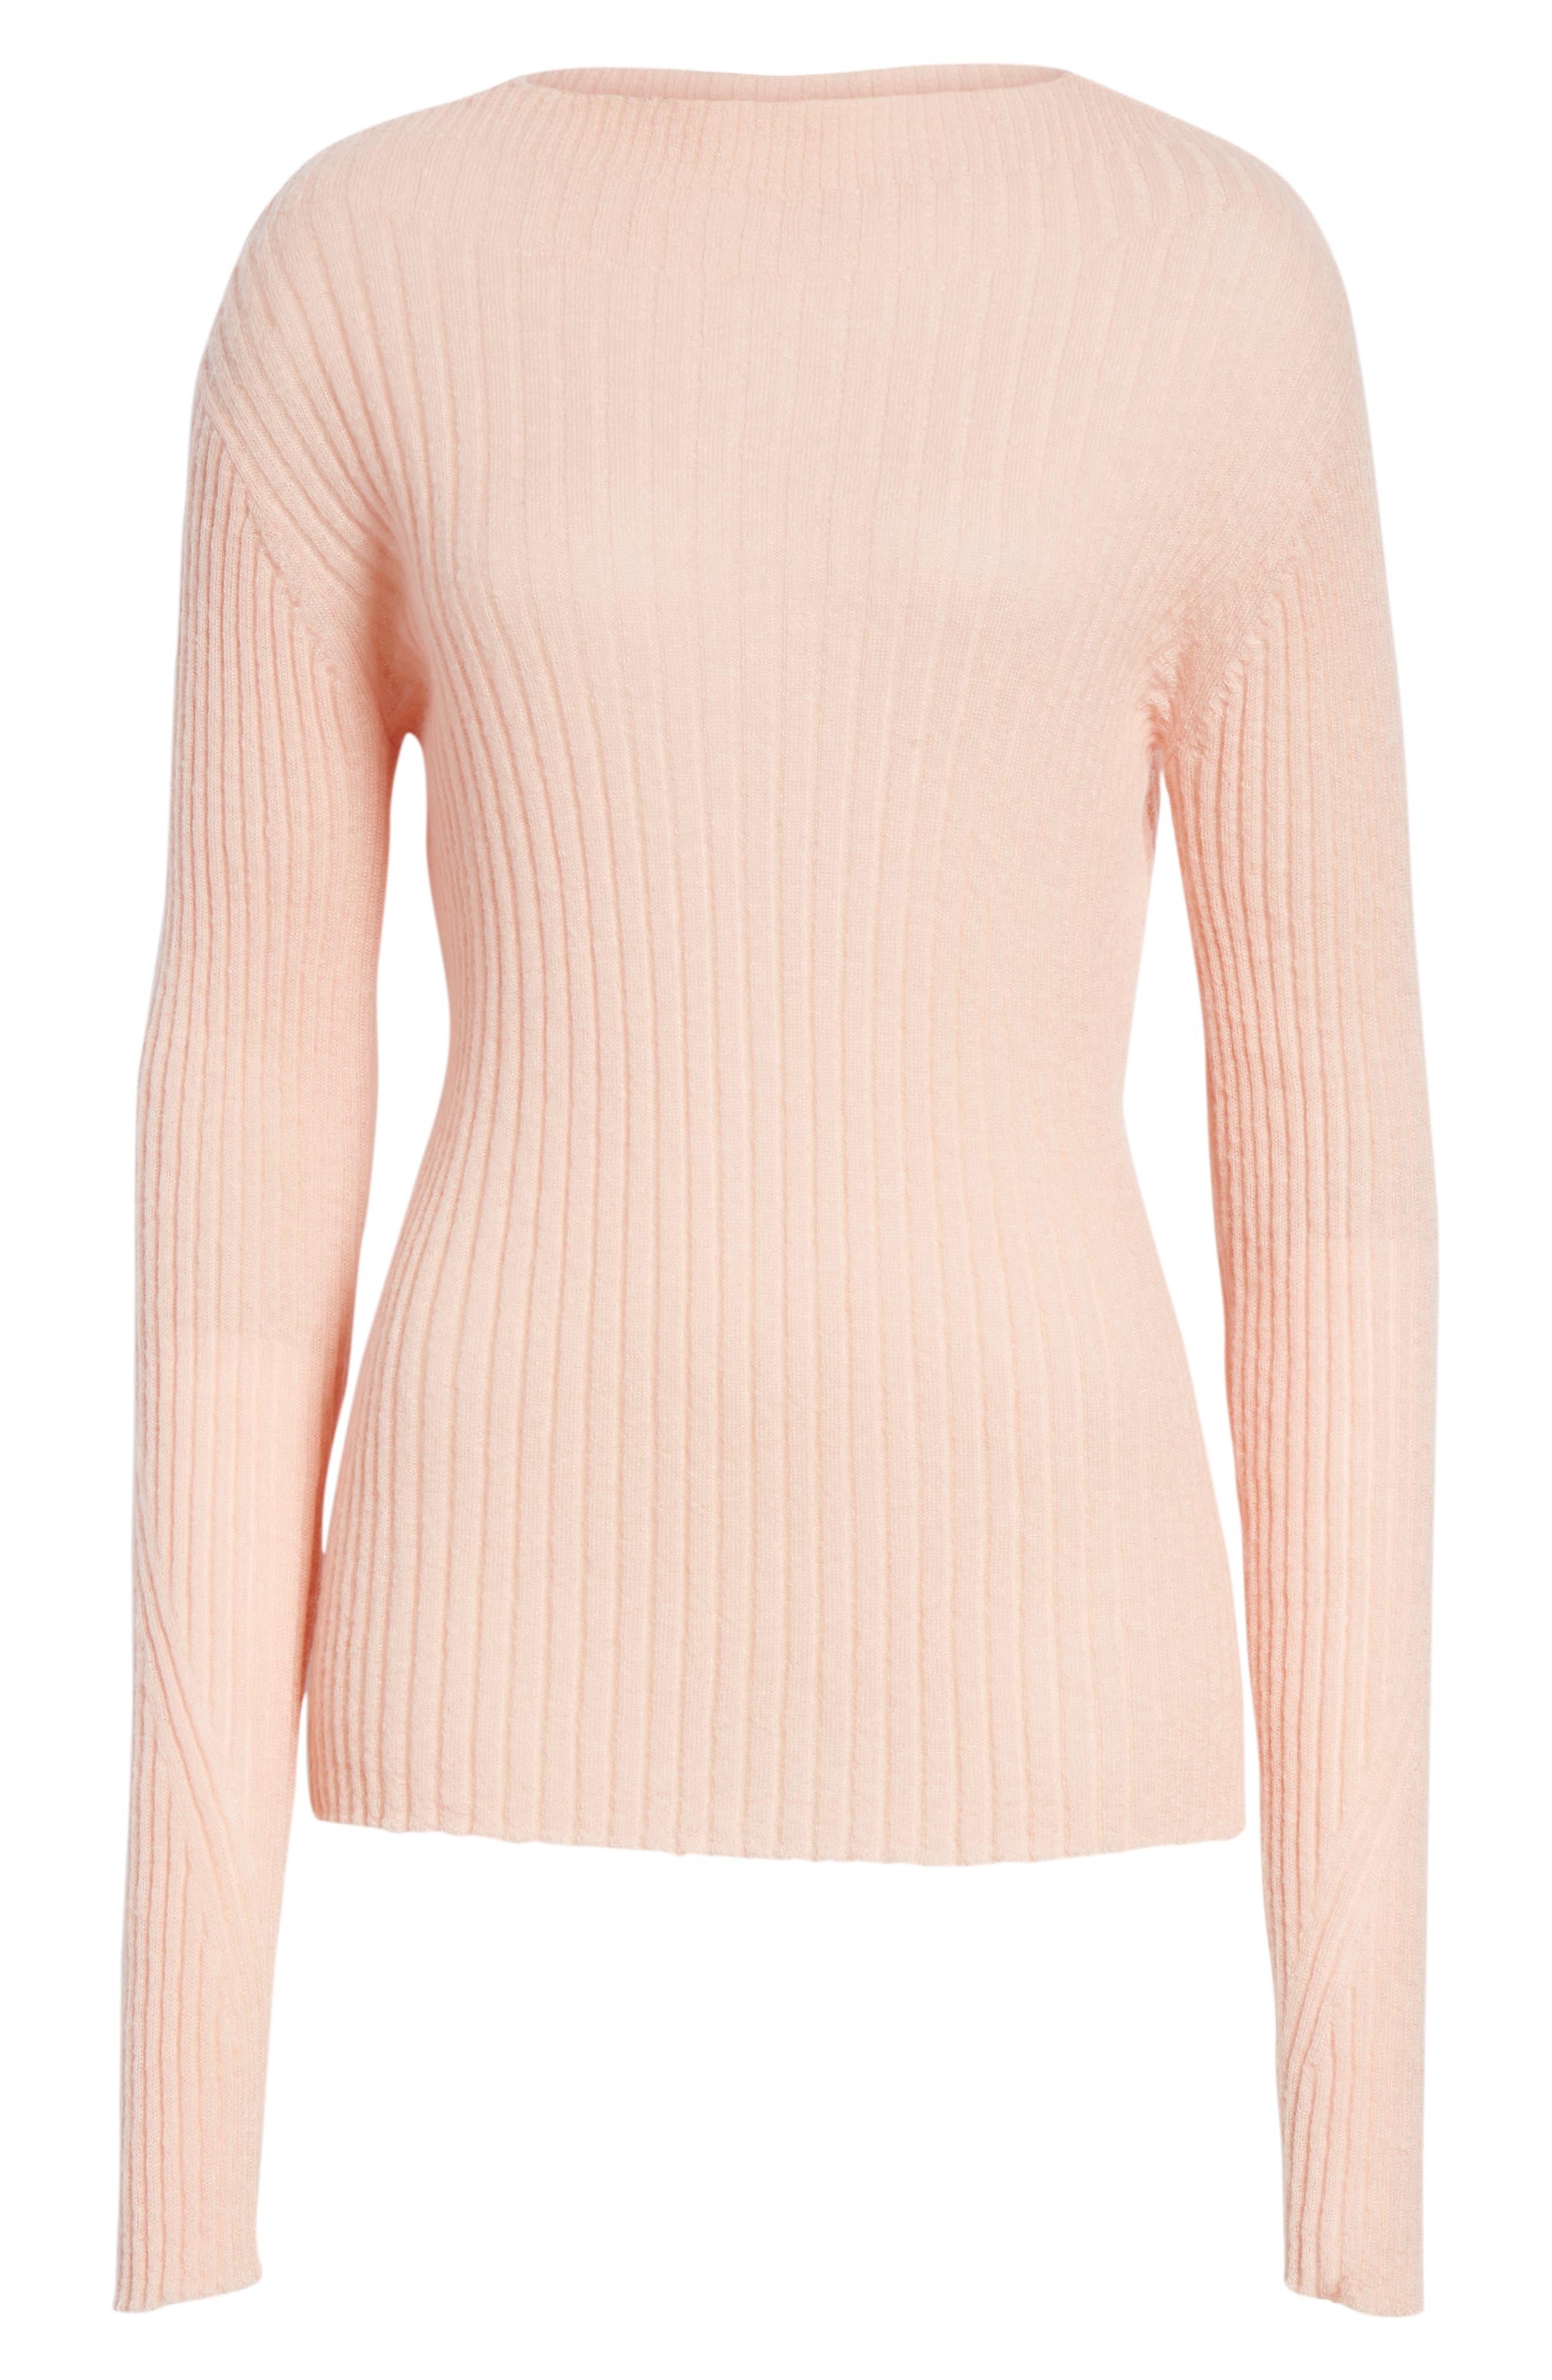 Donna Mohair Blend Sweater,                             Alternate thumbnail 6, color,                             950